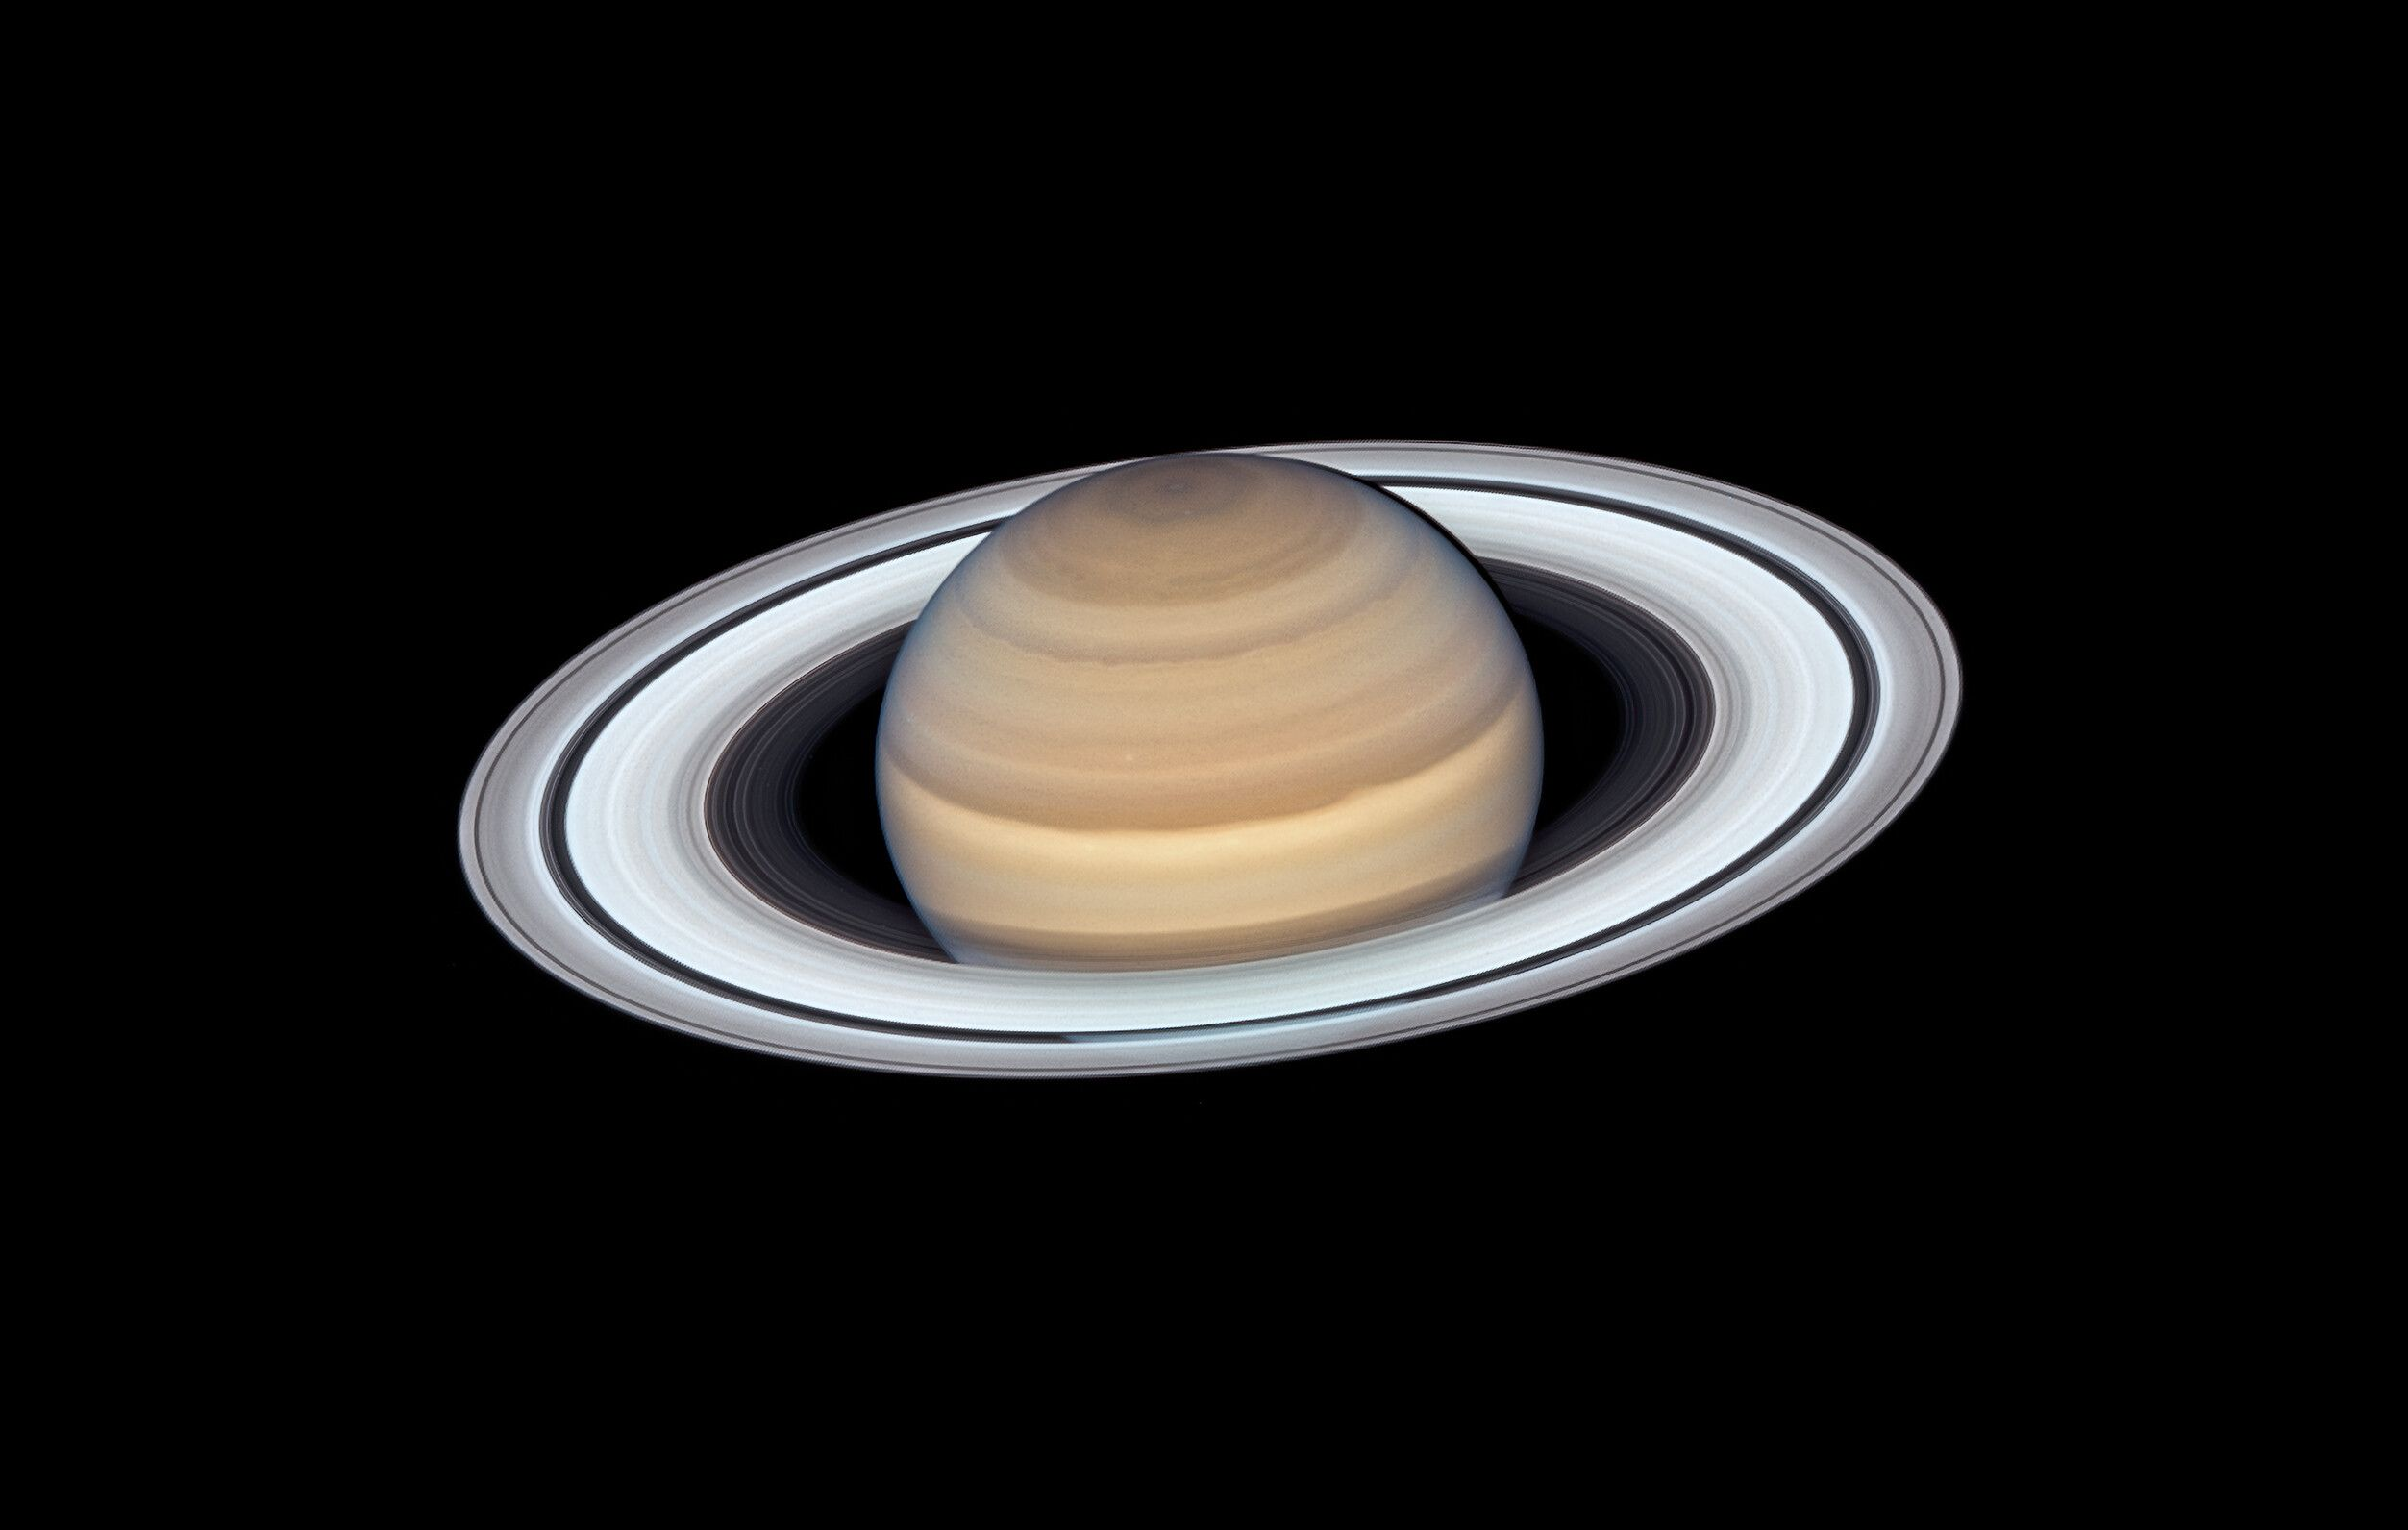 Saturn Is Still Stunning